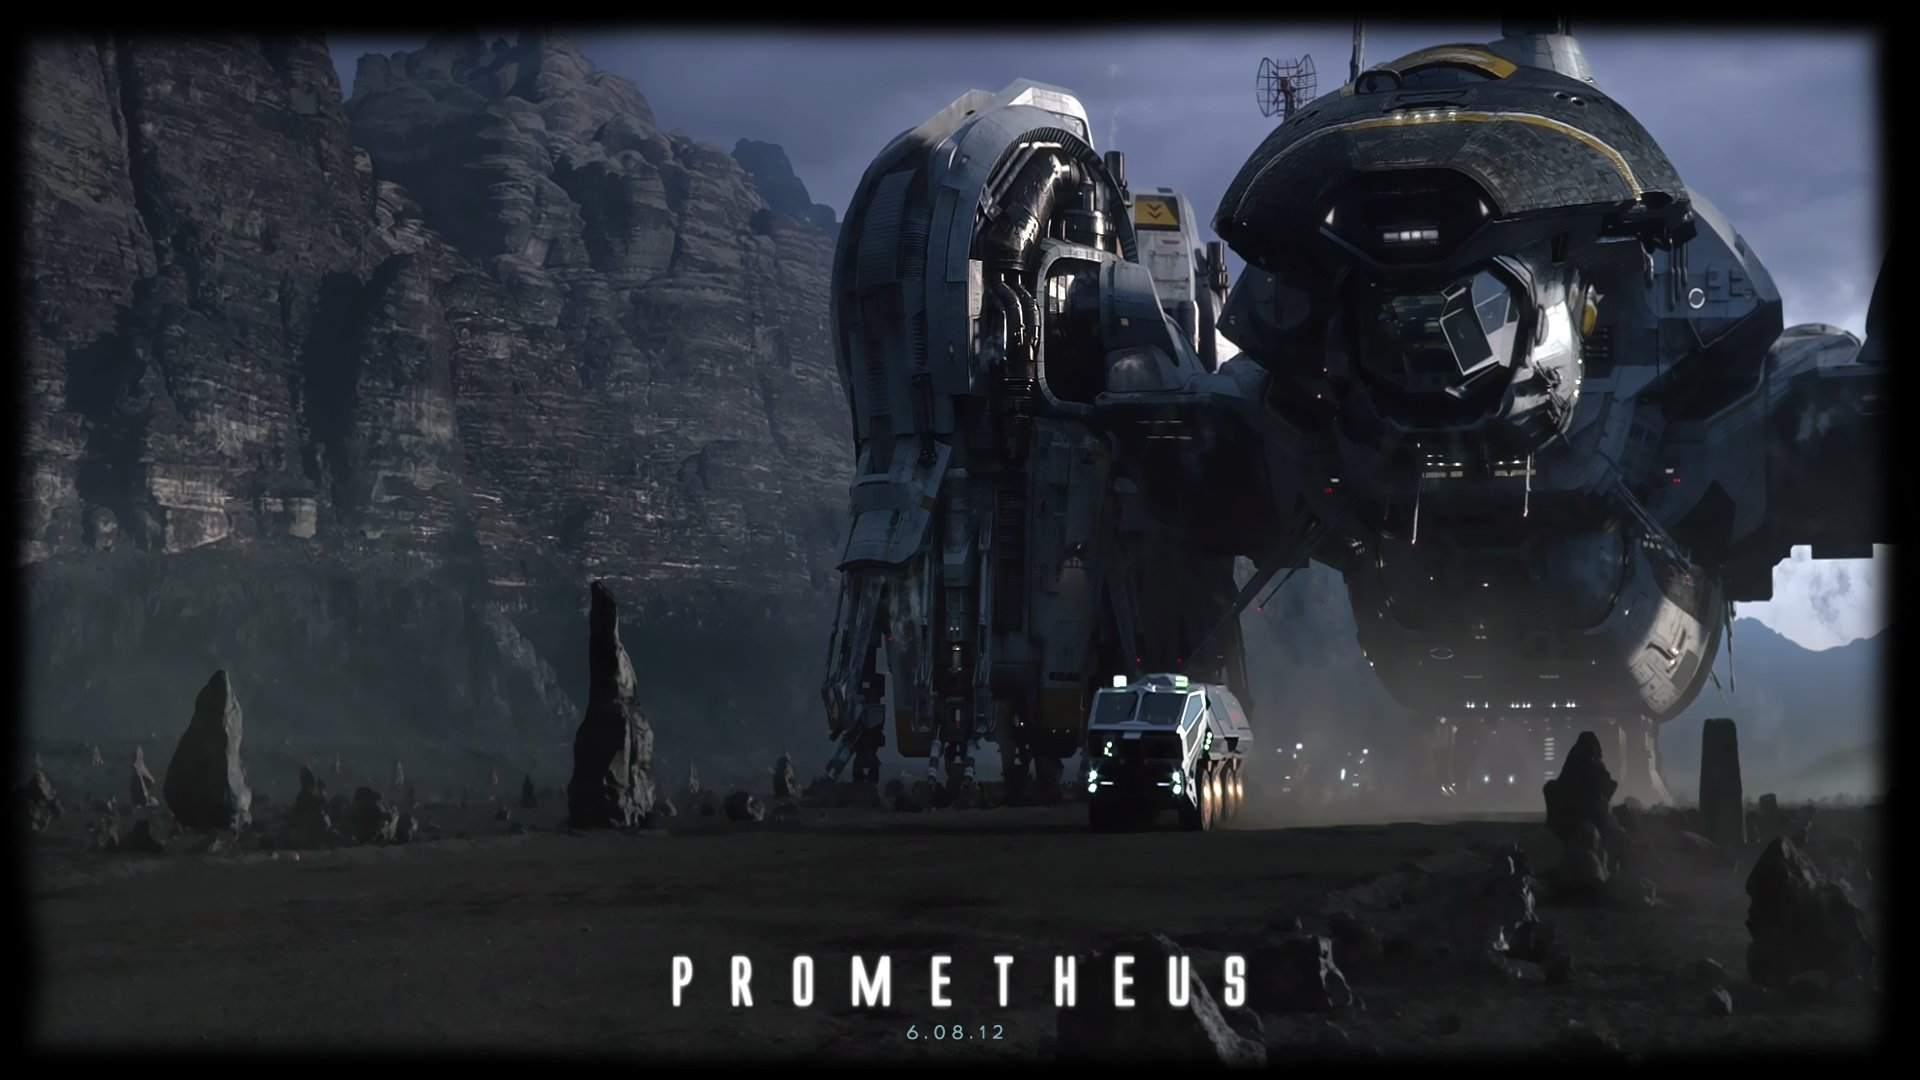 Prometheus Directored By Ridley Scott Fondo De Pantalla Hd